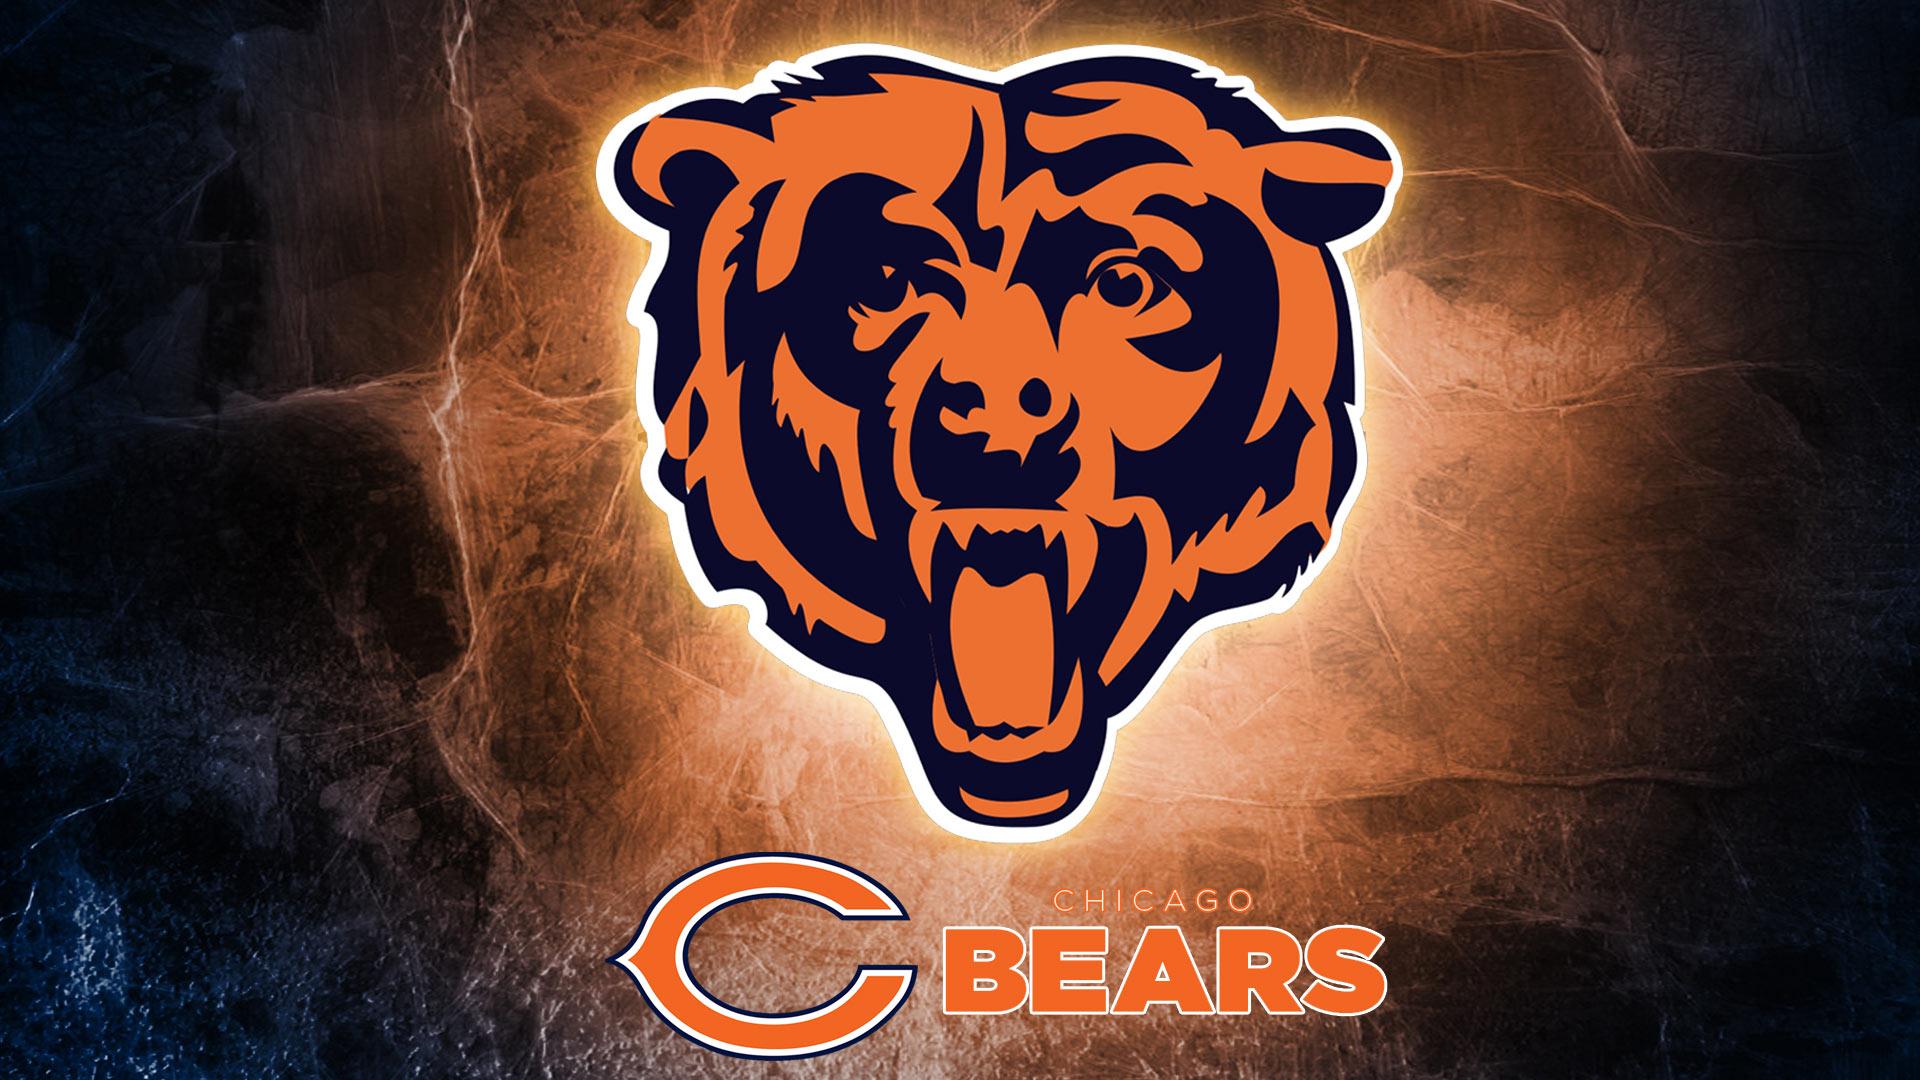 Download Chicago Bears logo Hd 1080p Wallpaper screen size 1920x1080